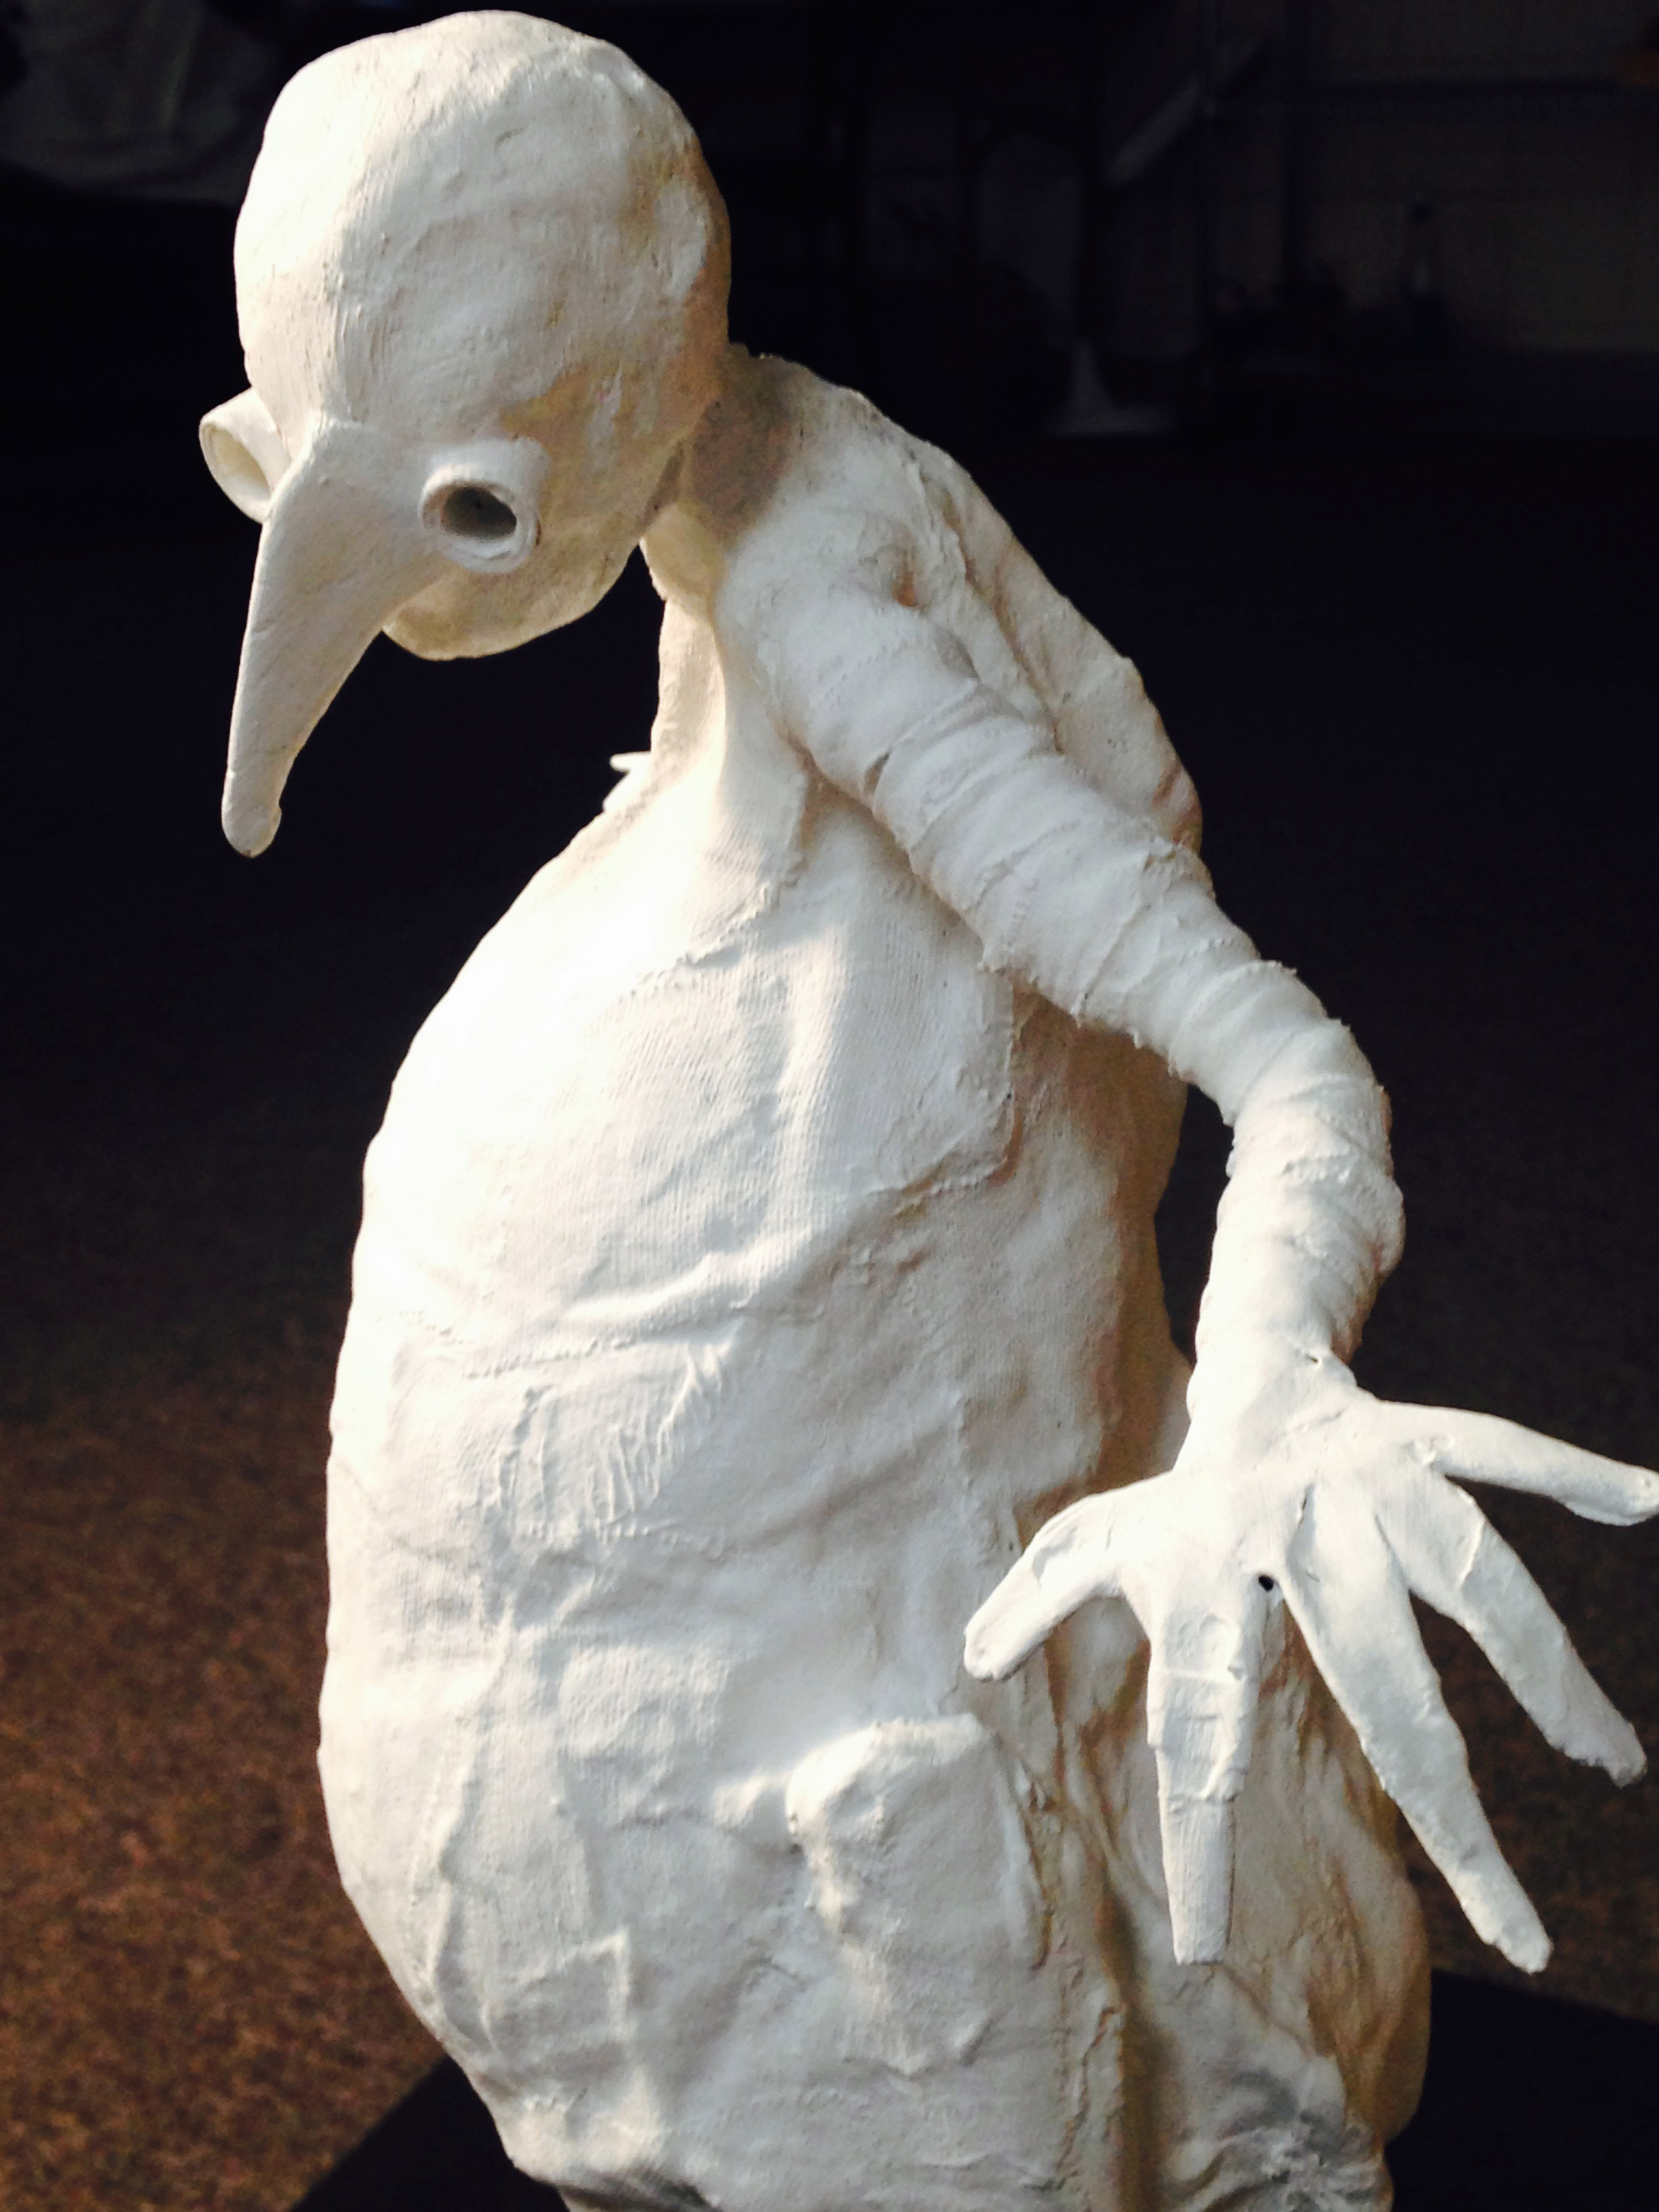 Refining Sculptural Details